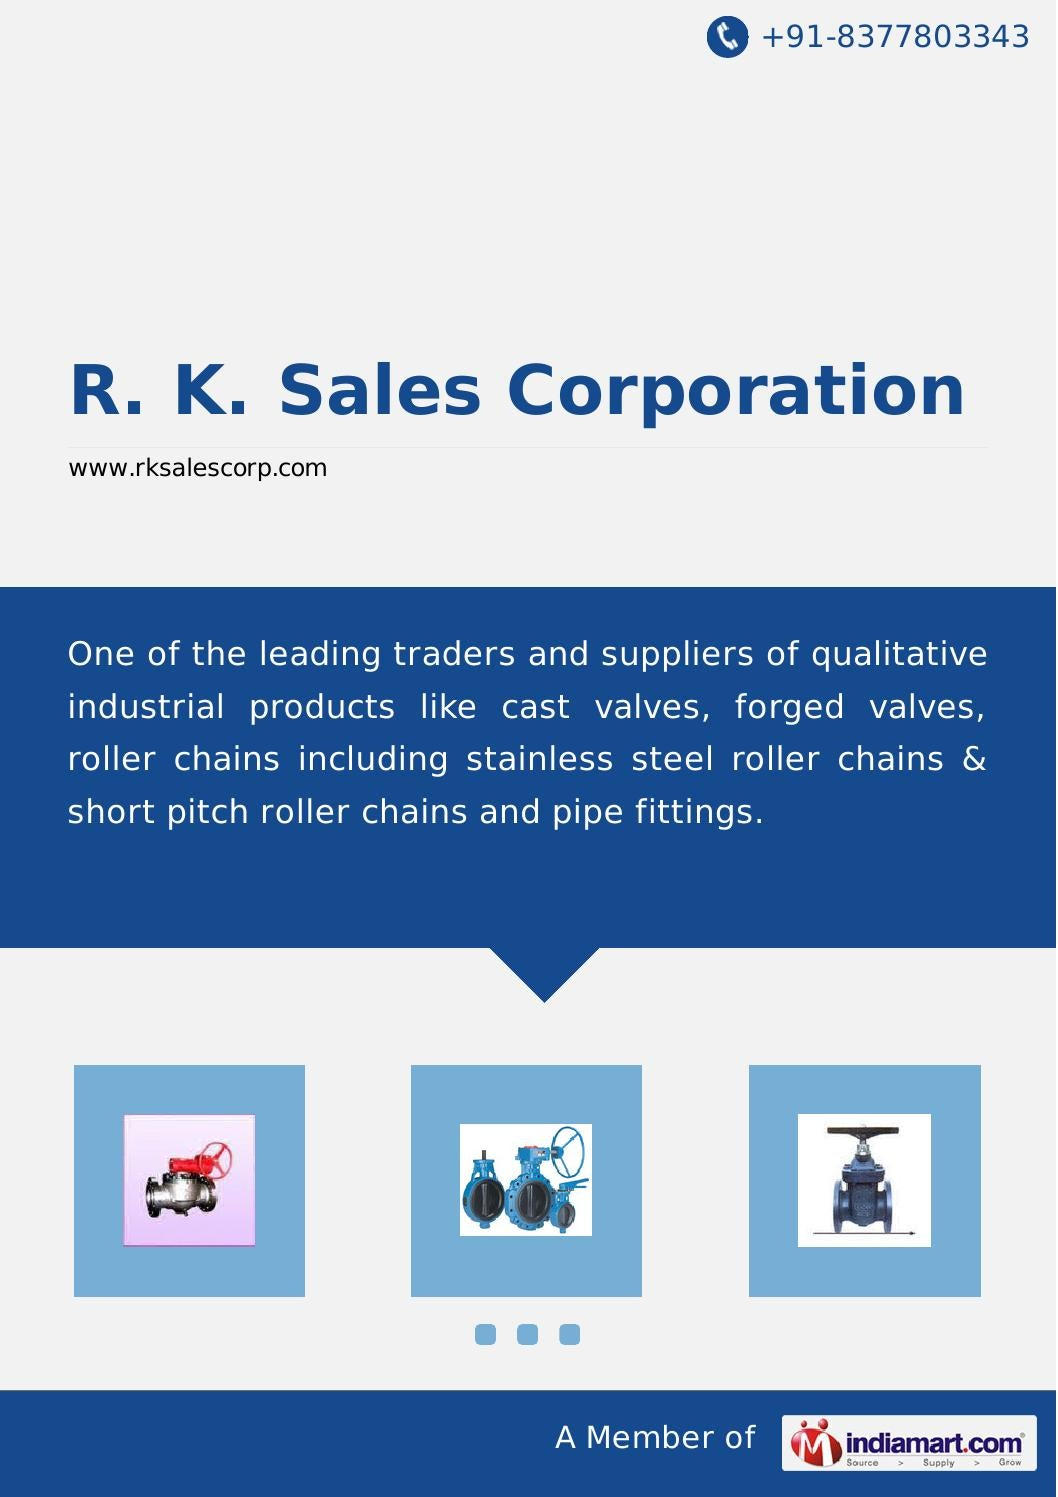 R k sales corporation by R  K  Sales Corporation - issuu